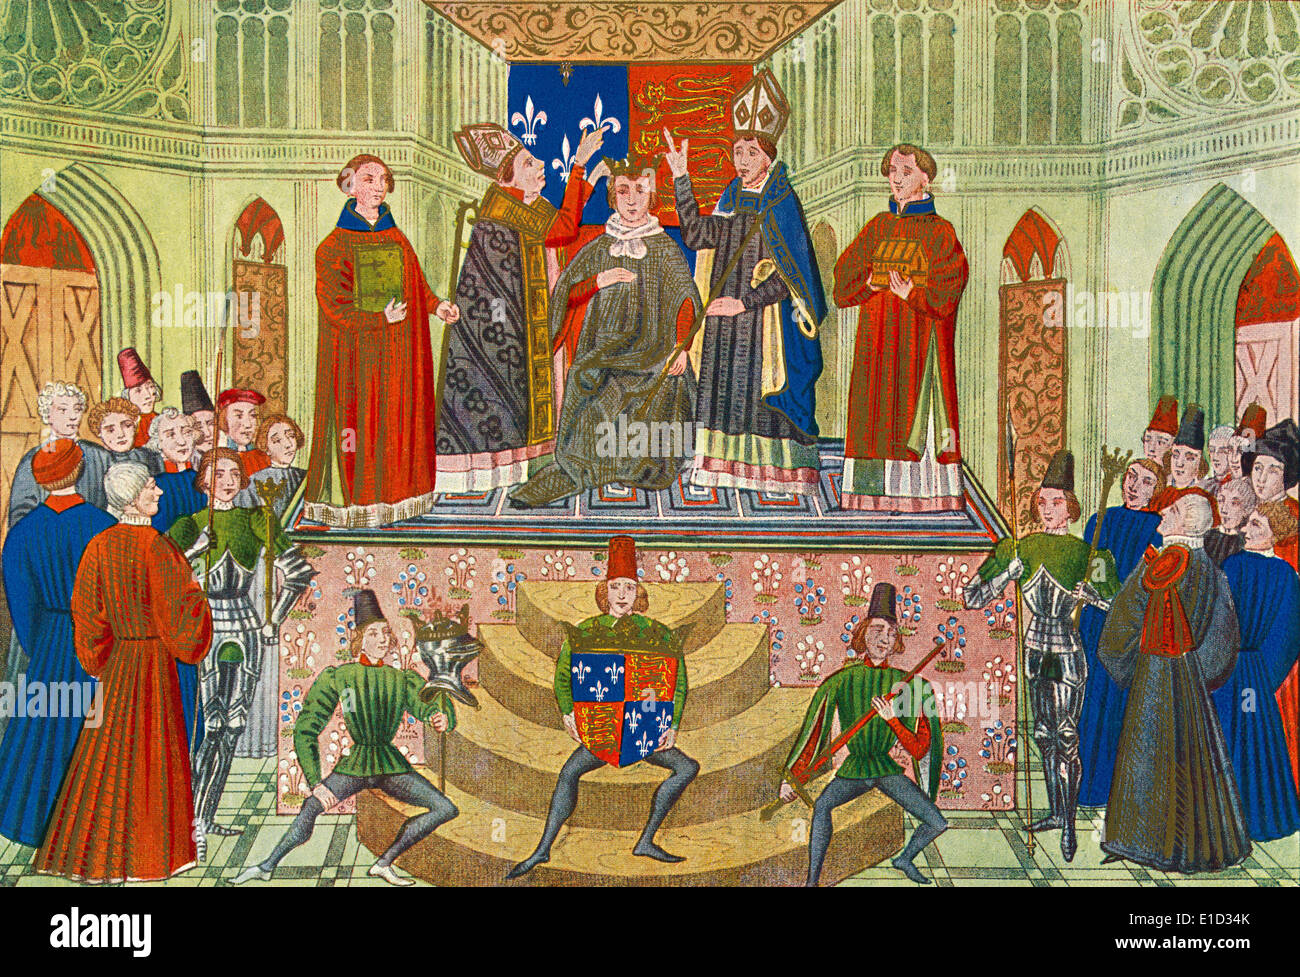 The coronation of Henry IV, Westminster Abbey, London, England in 1399. Henry IV aka Henry Bolingbroke,1367 – 1413.  King of England - Stock Image